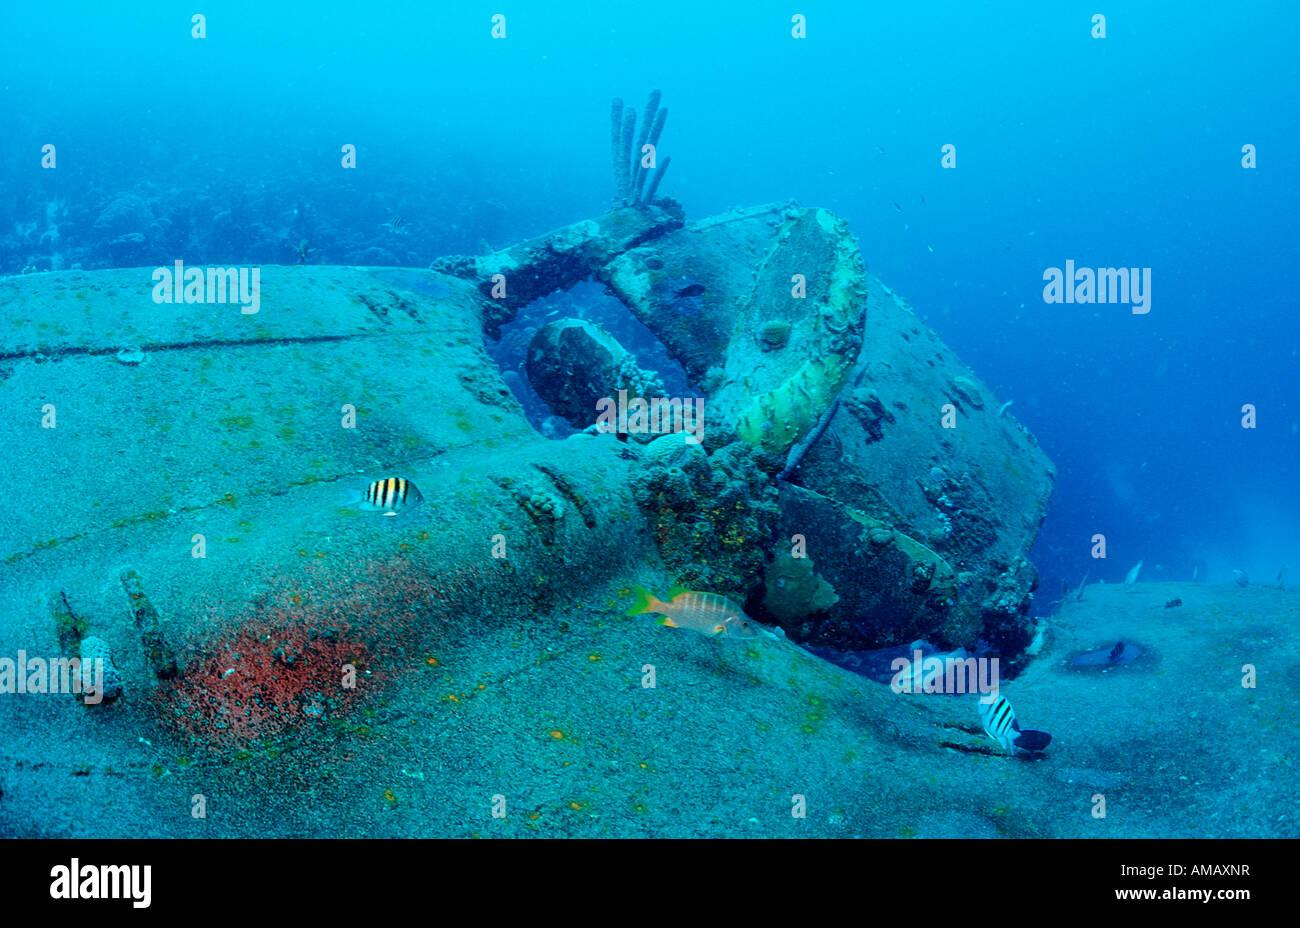 Hilma Hooker nave relitto elica Antille Olandesi Bonaire Mar dei Caraibi Immagini Stock